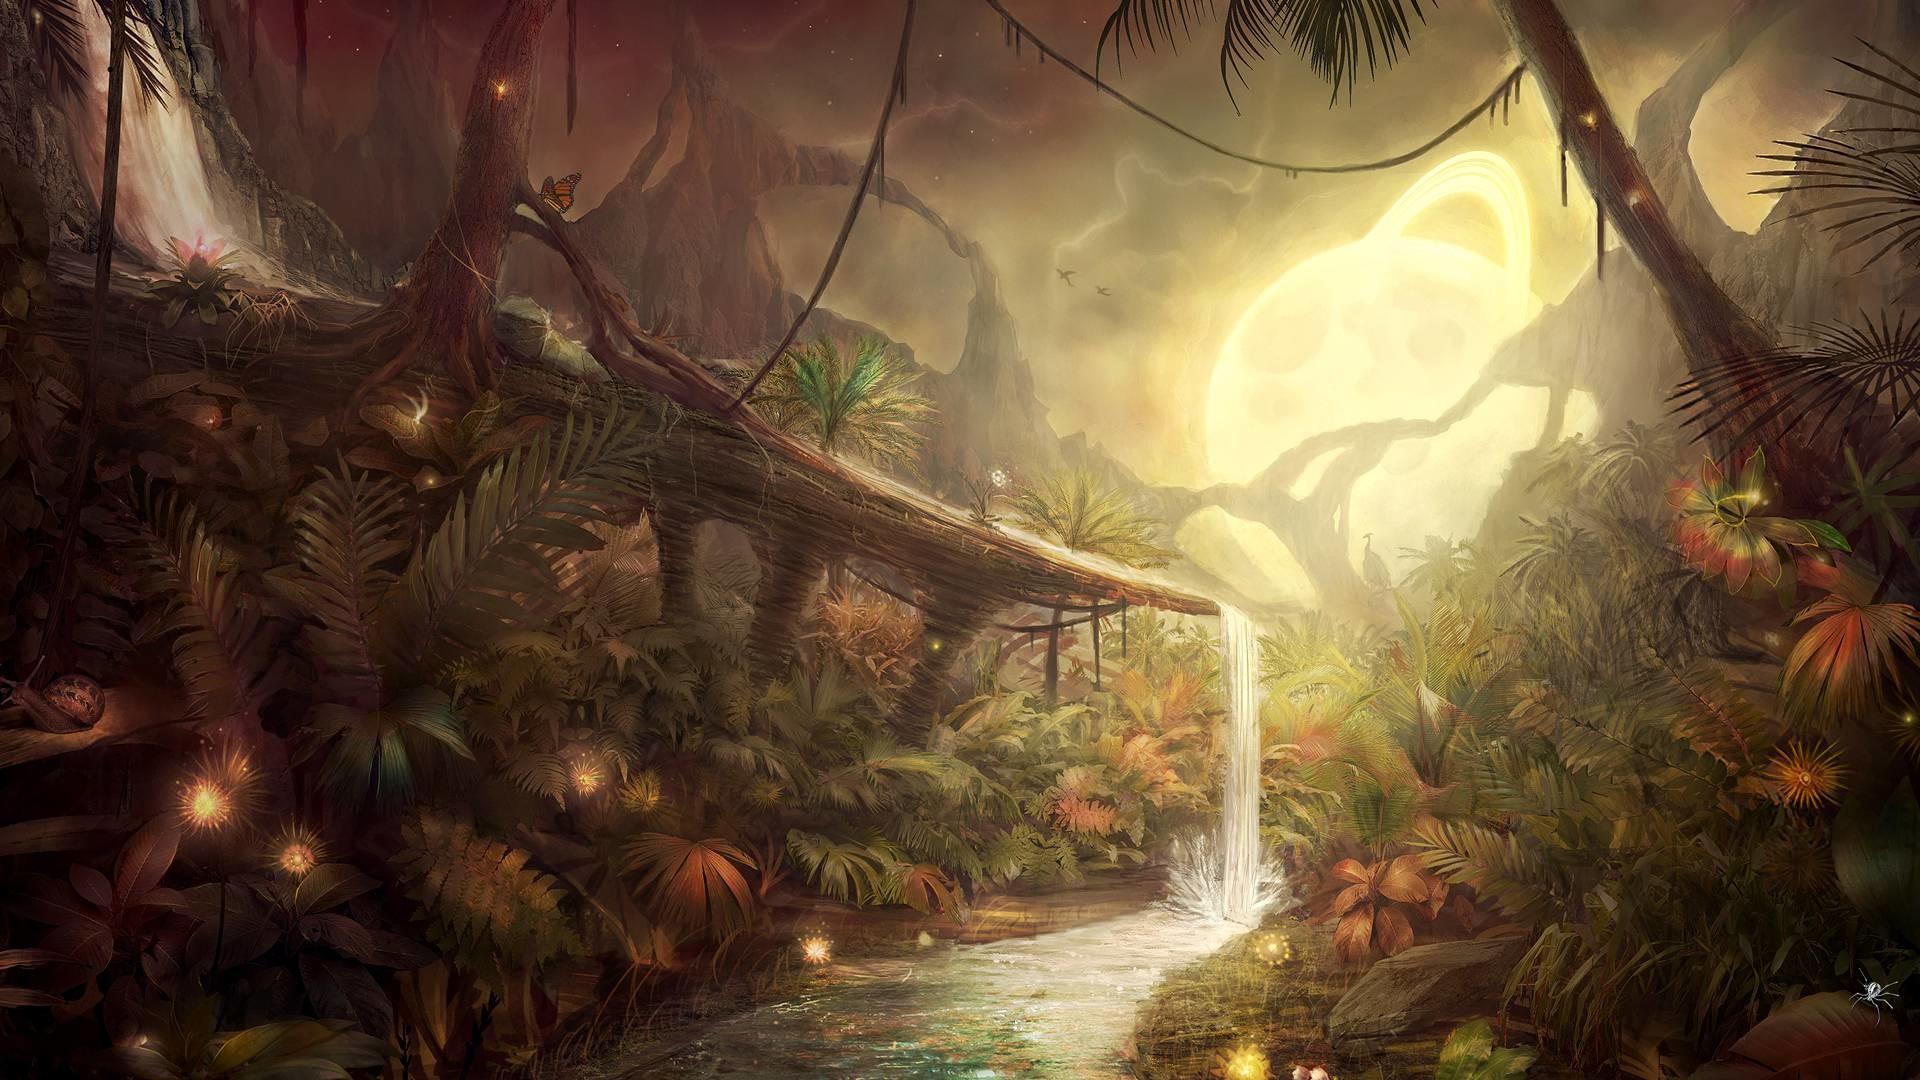 Small waterfall in the fantasy forest wallpaper, Small waterfall in the fantasy  forest Digital Art HD desktop wallpaper